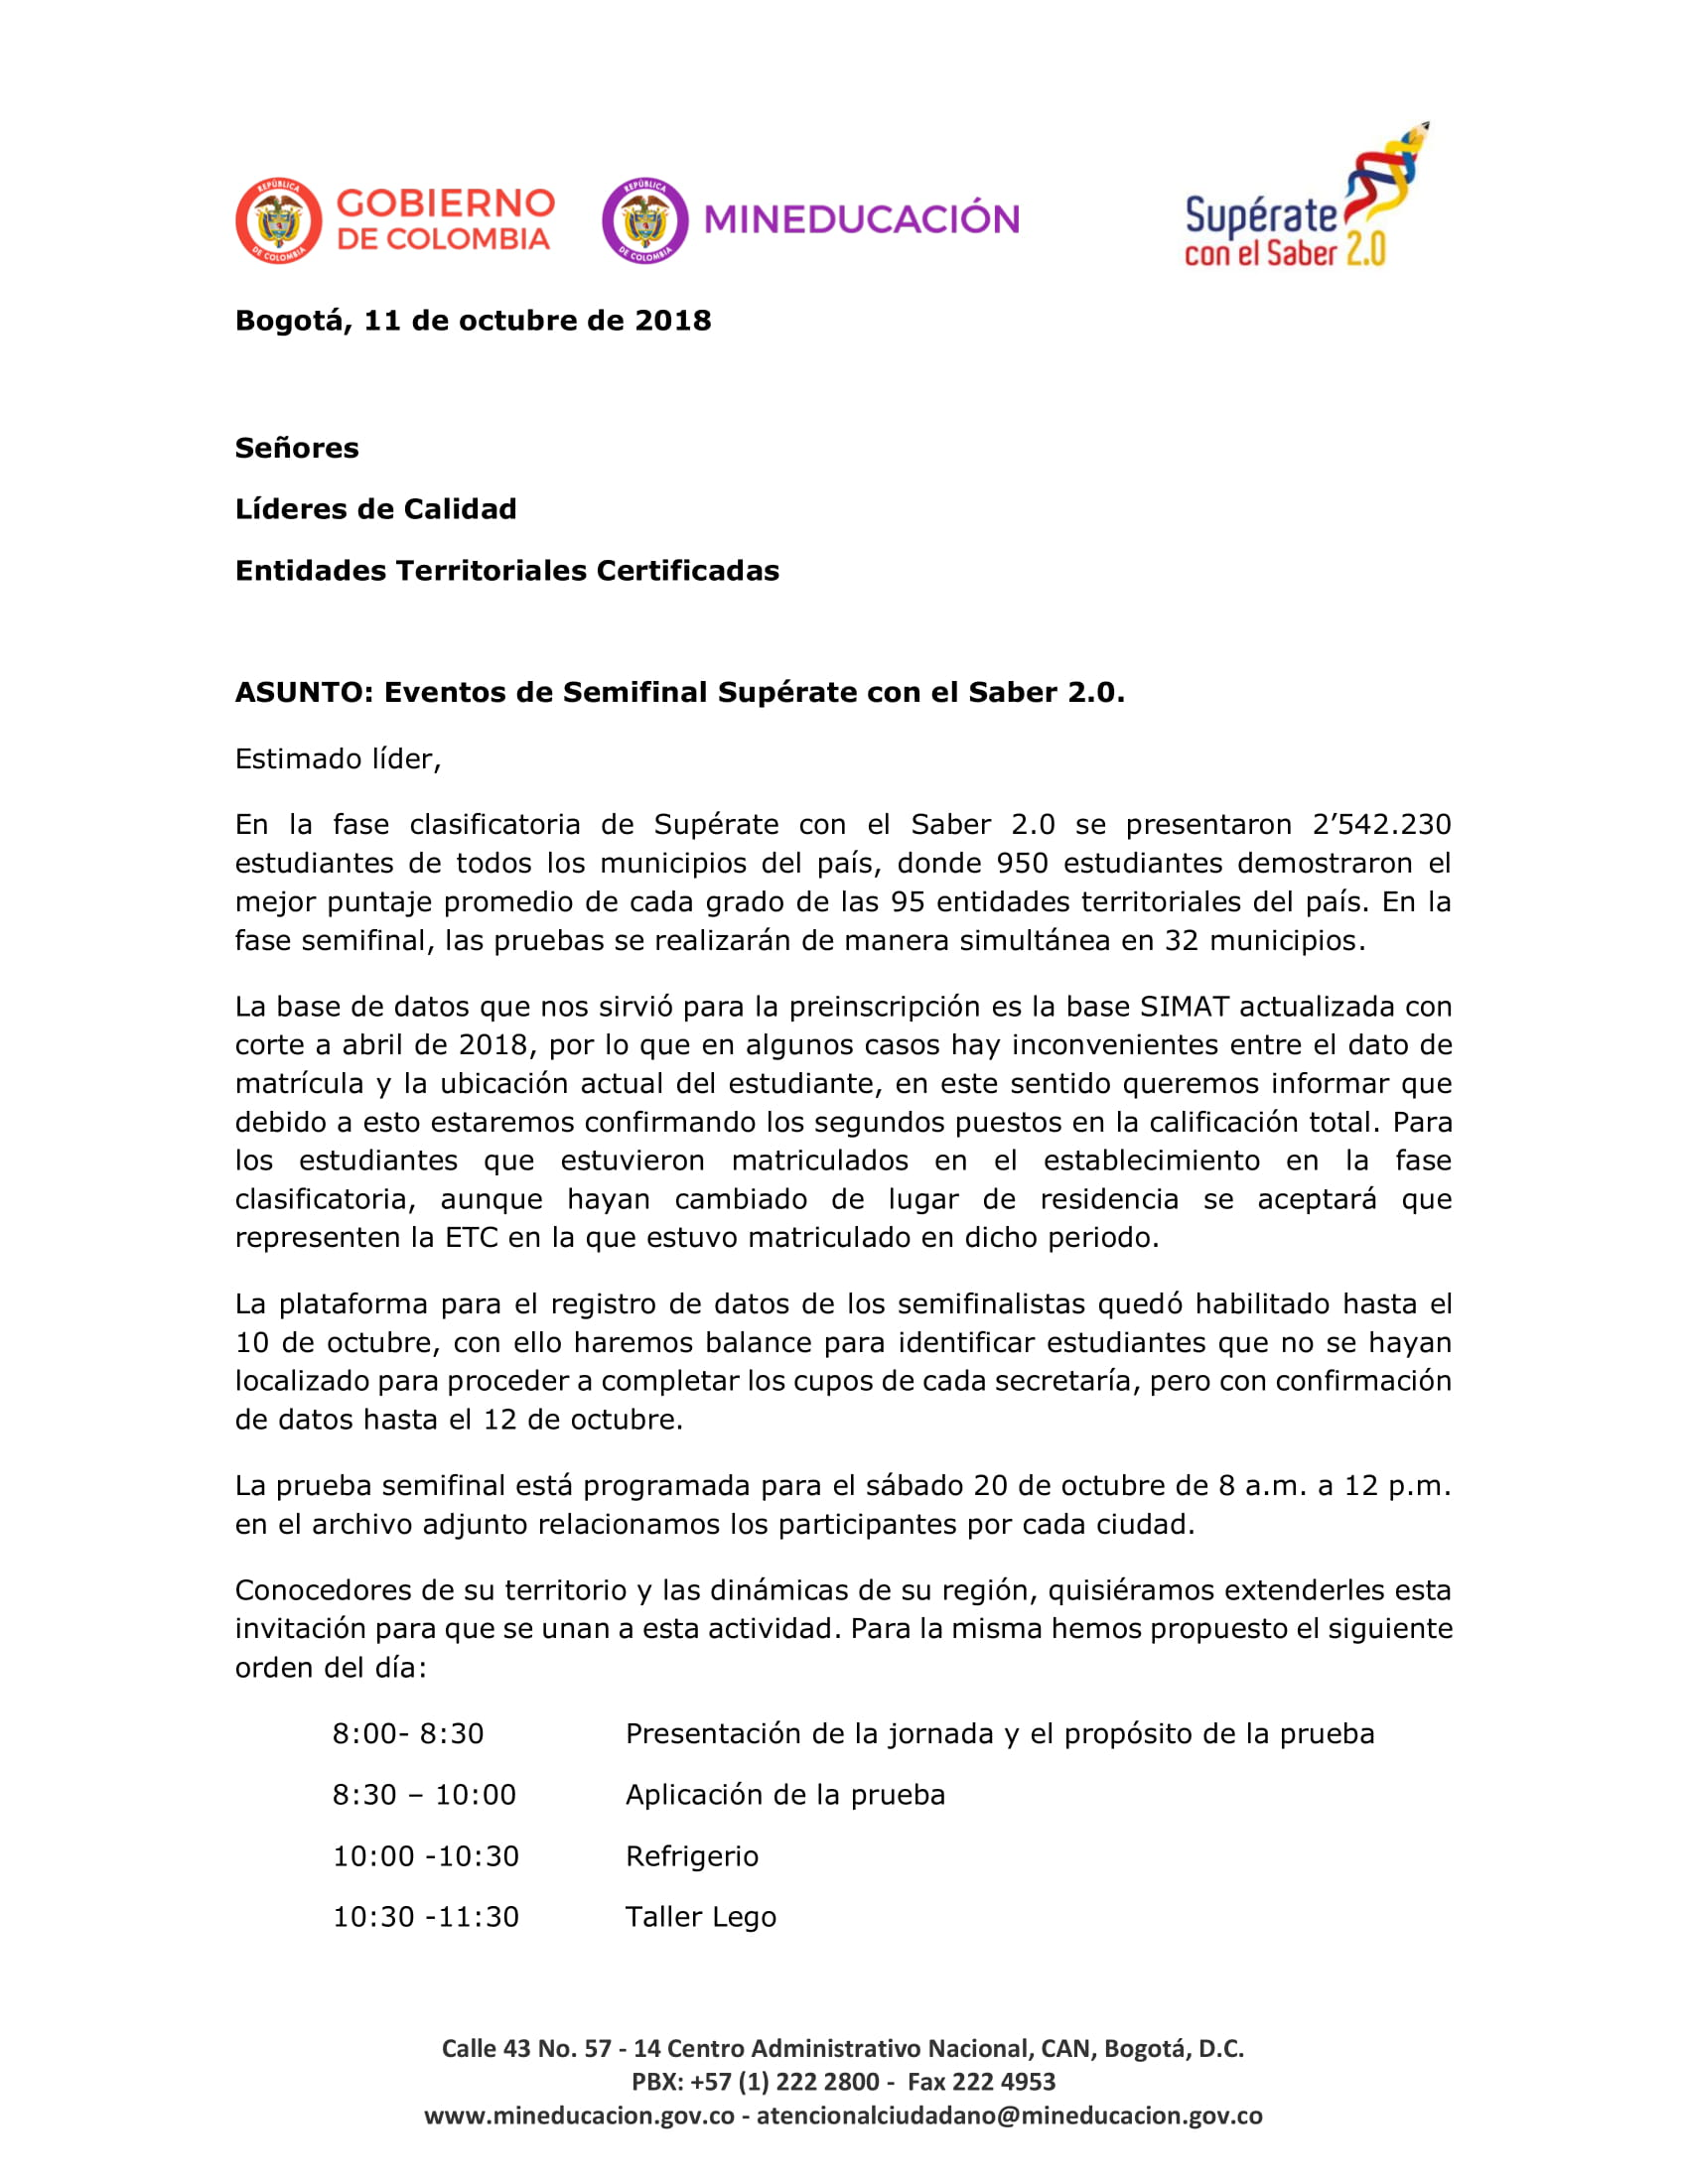 comunicado_semifinales_superate_2018-1